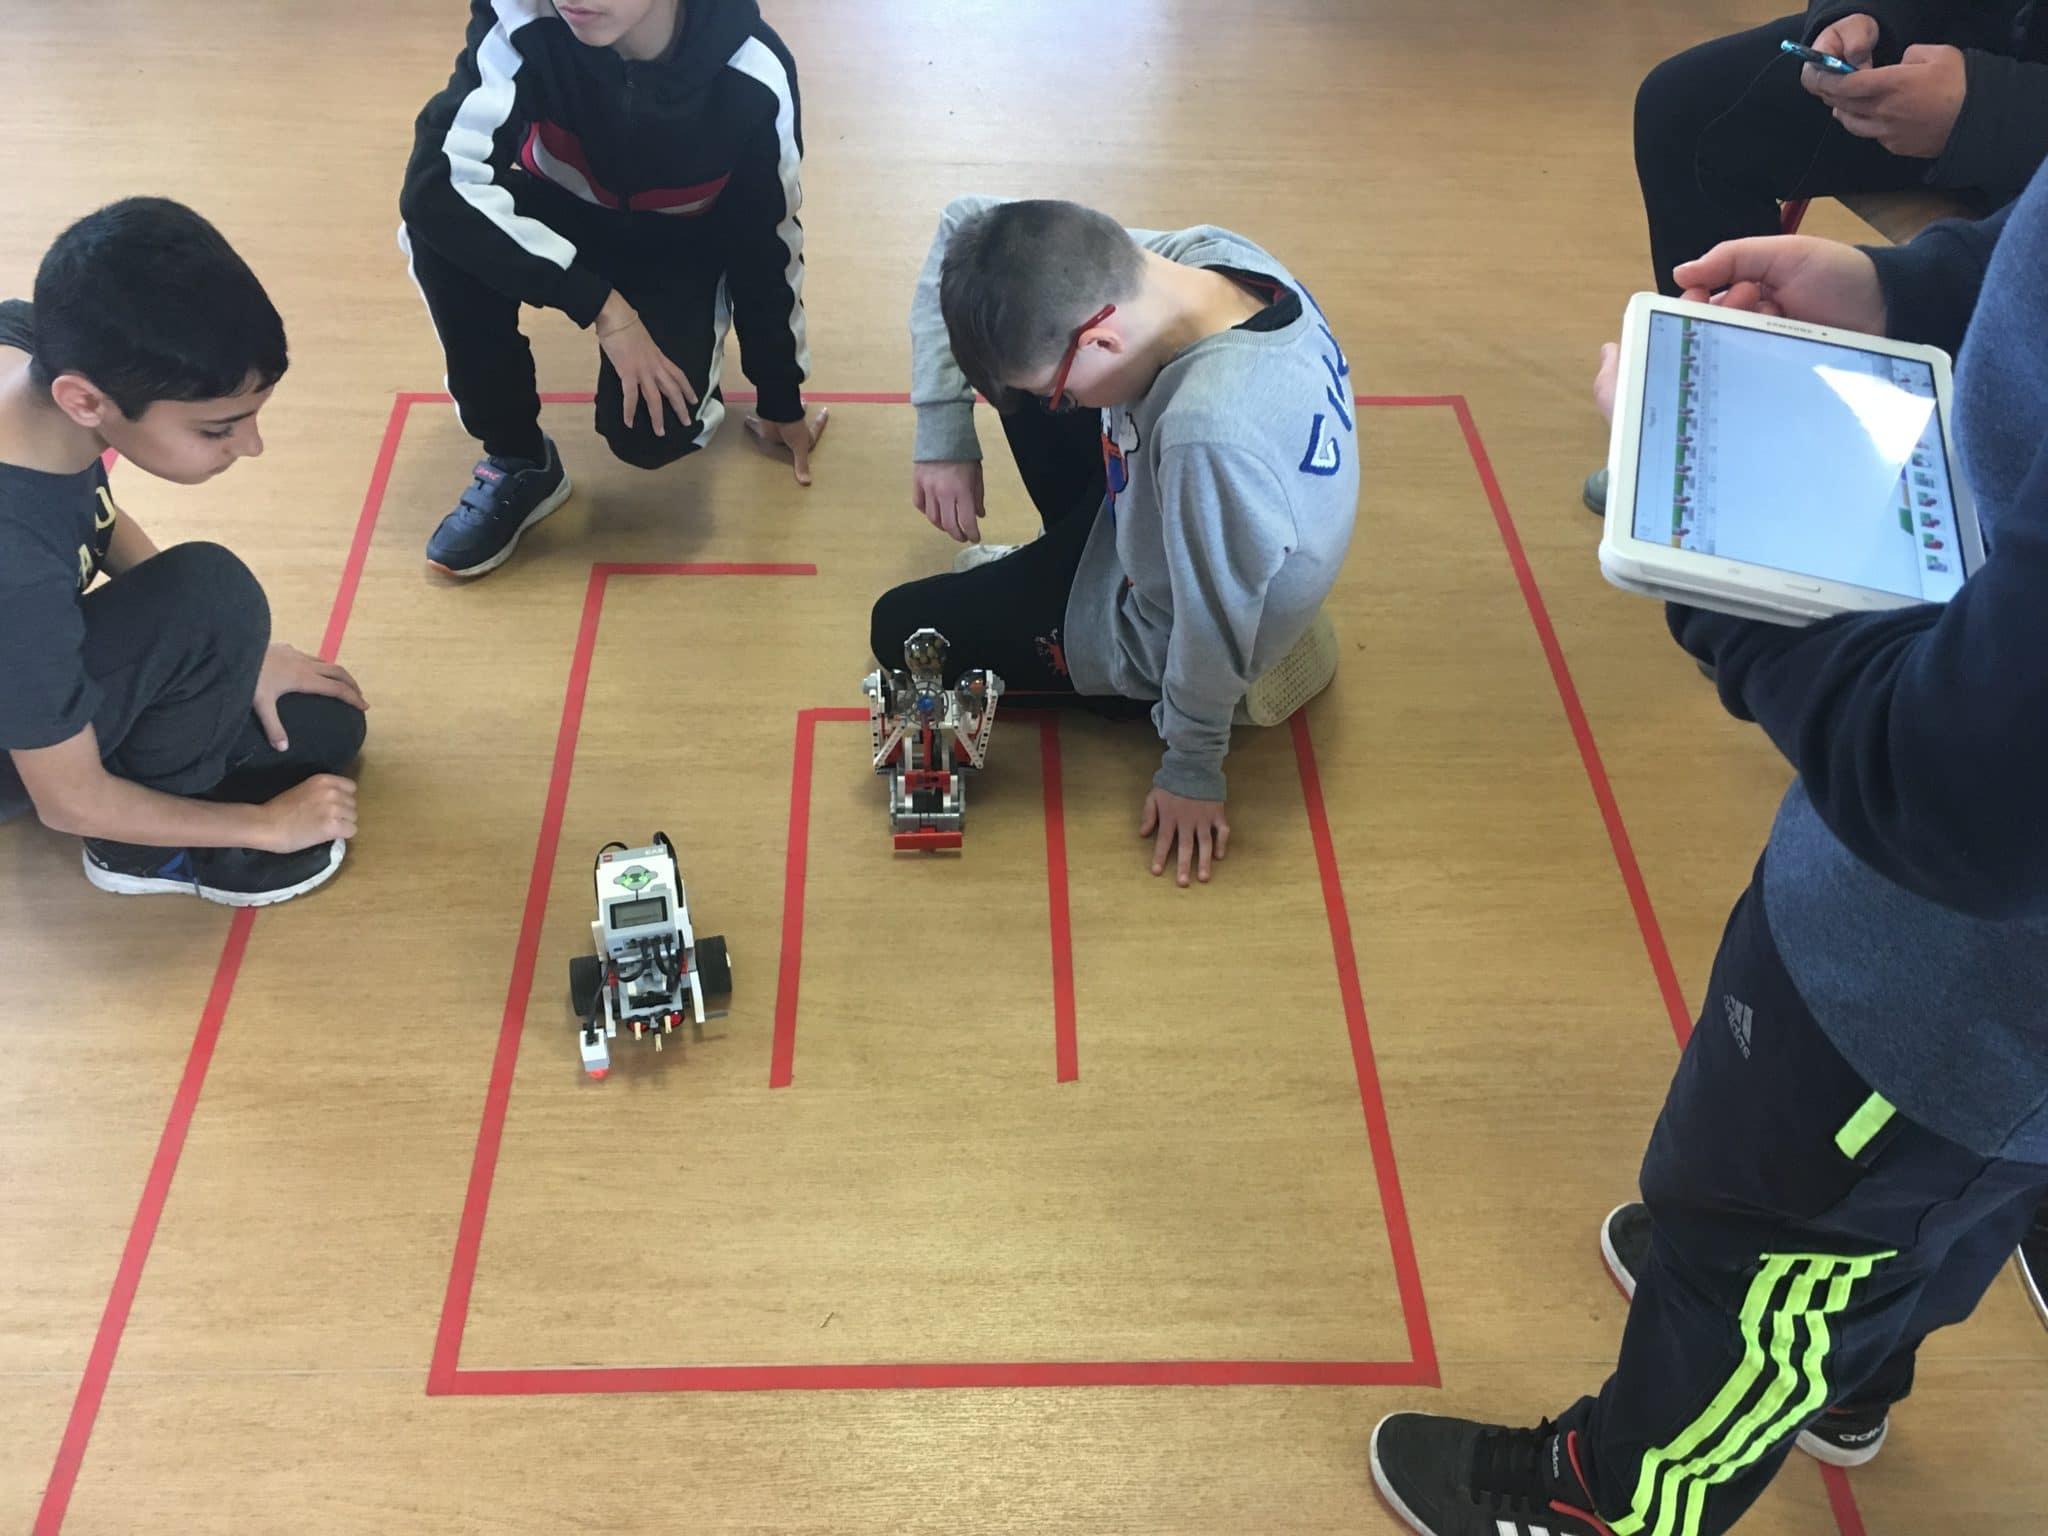 Cyberbase: quand les robots attaquent !